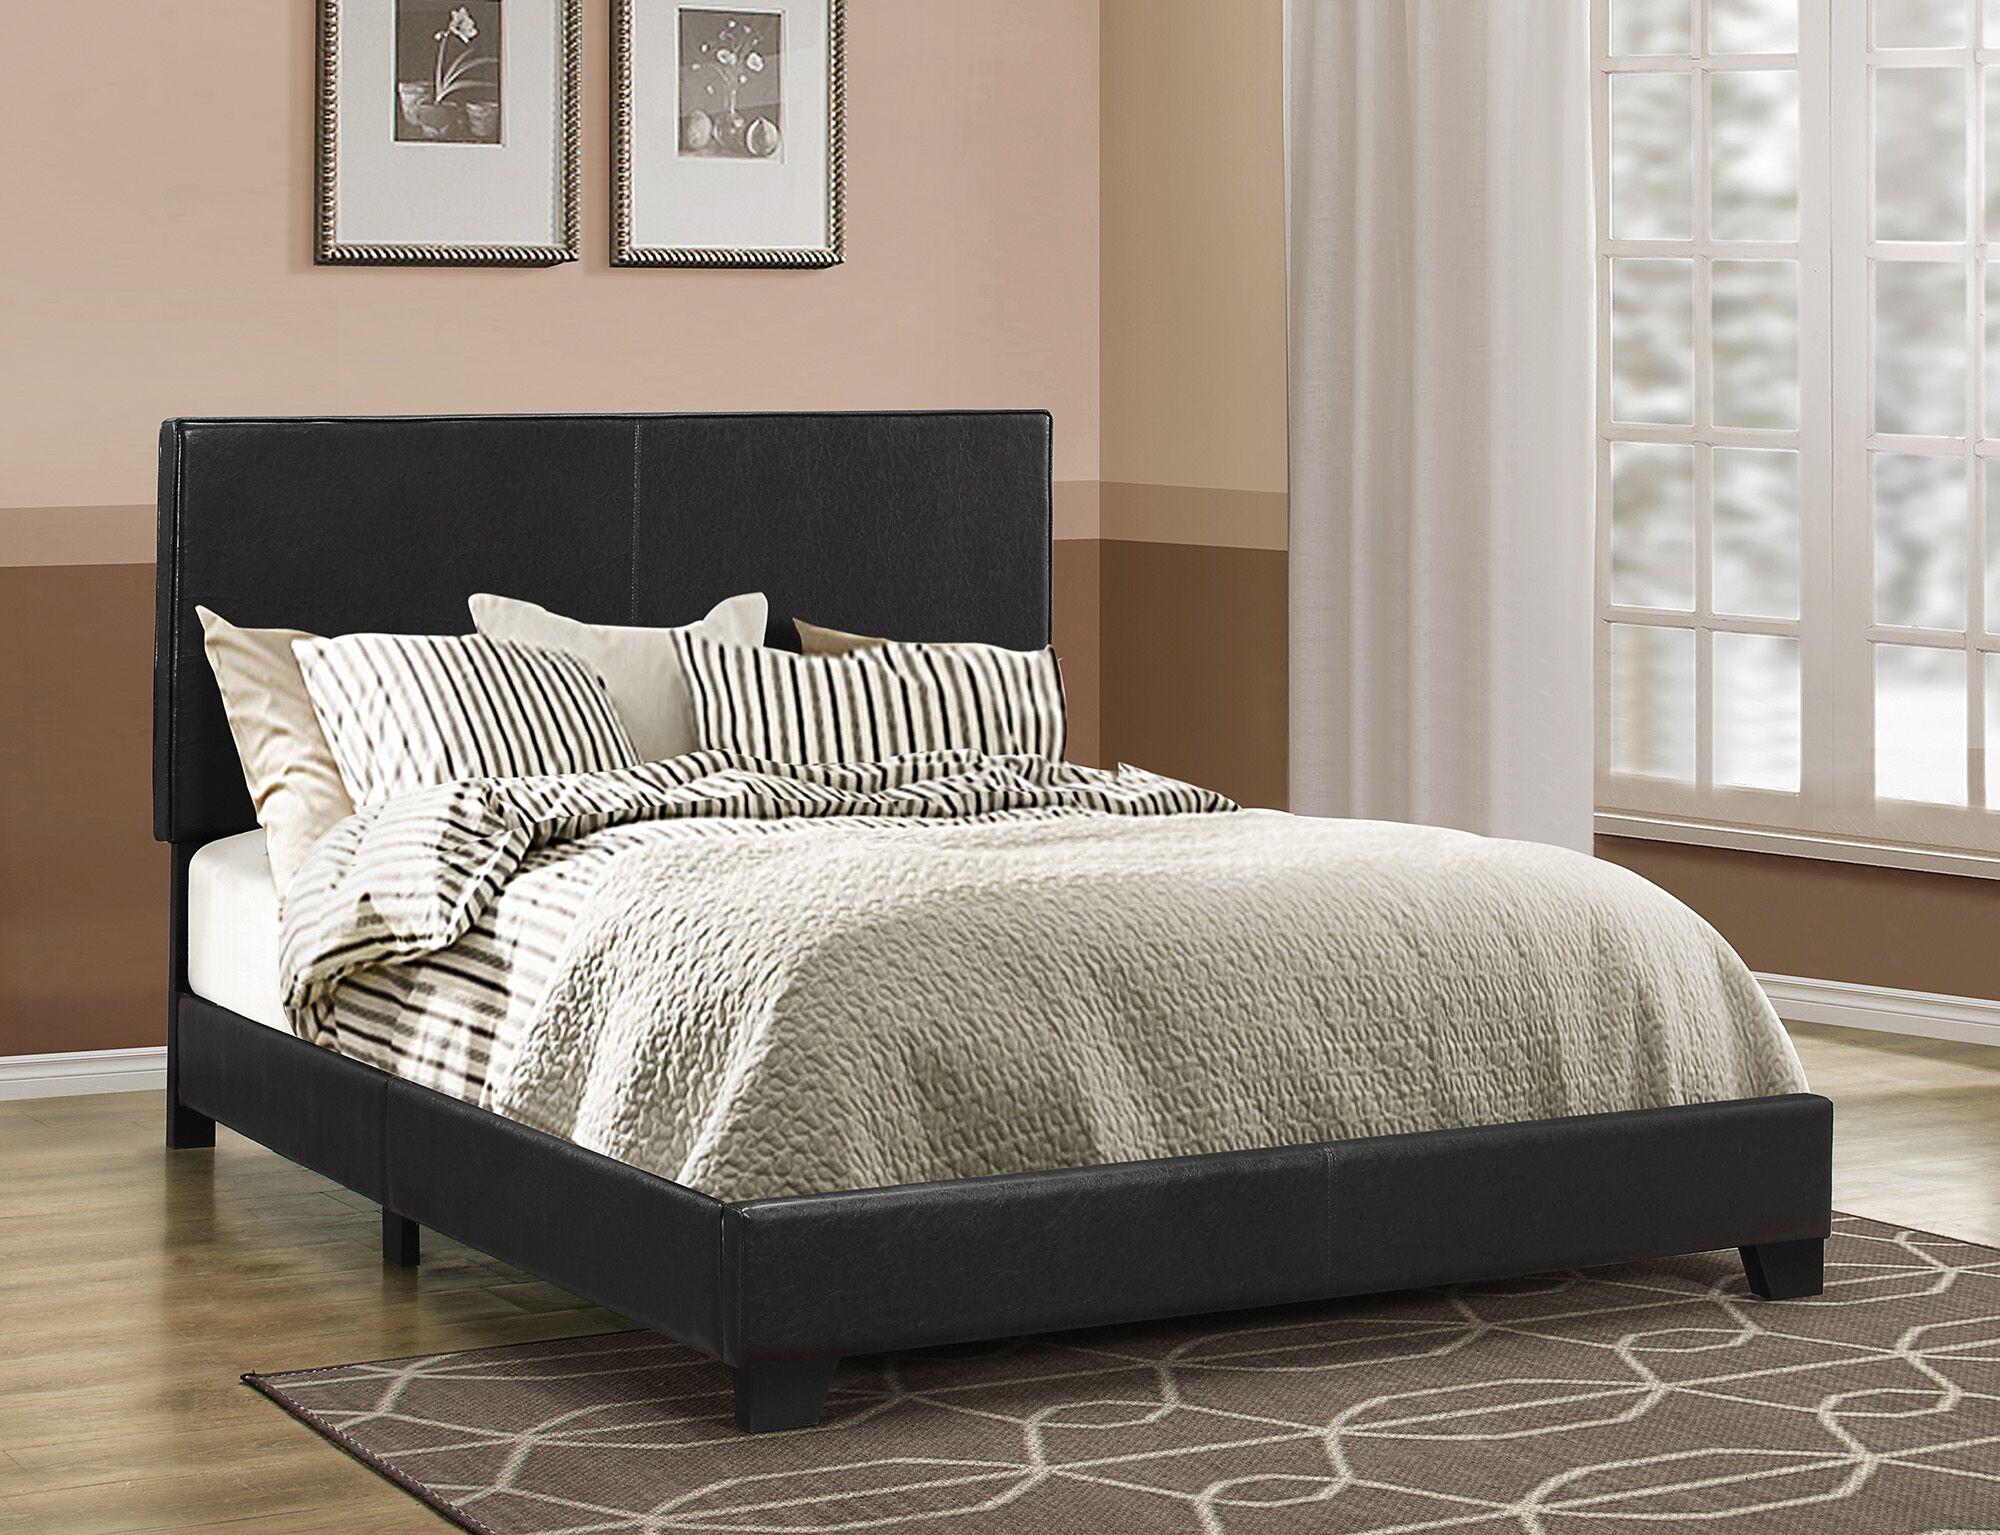 Fenagh Upholstered Panel Bed Size: Full, Color: Black